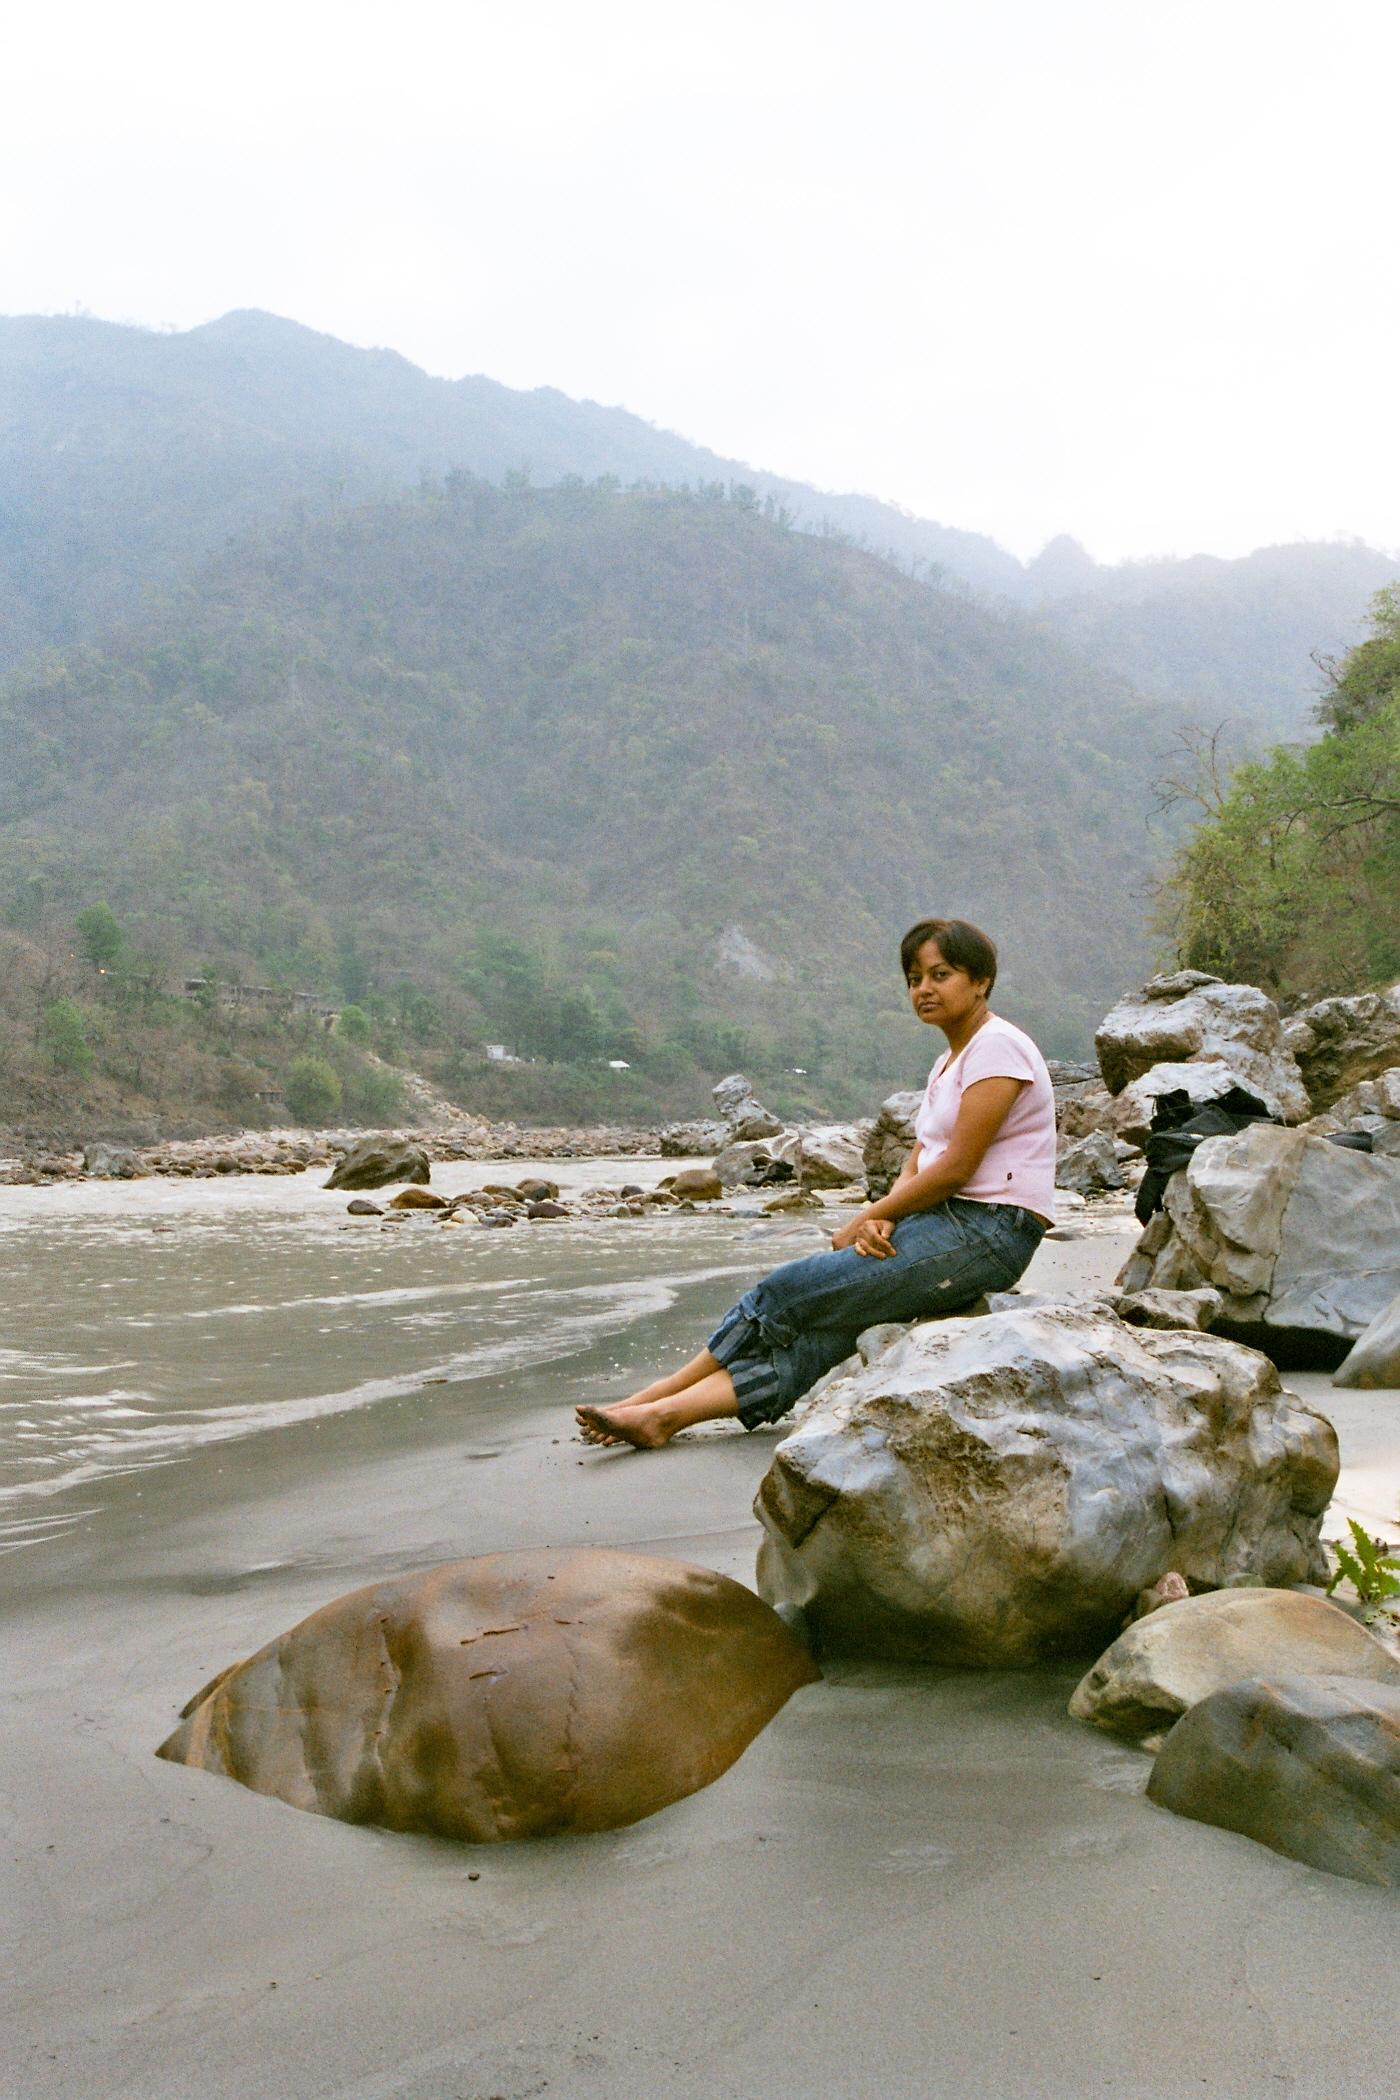 Walking in the hills. Meditations by the river Ganga. Lovely walks beyond Laxman Jhula-Rishikesh